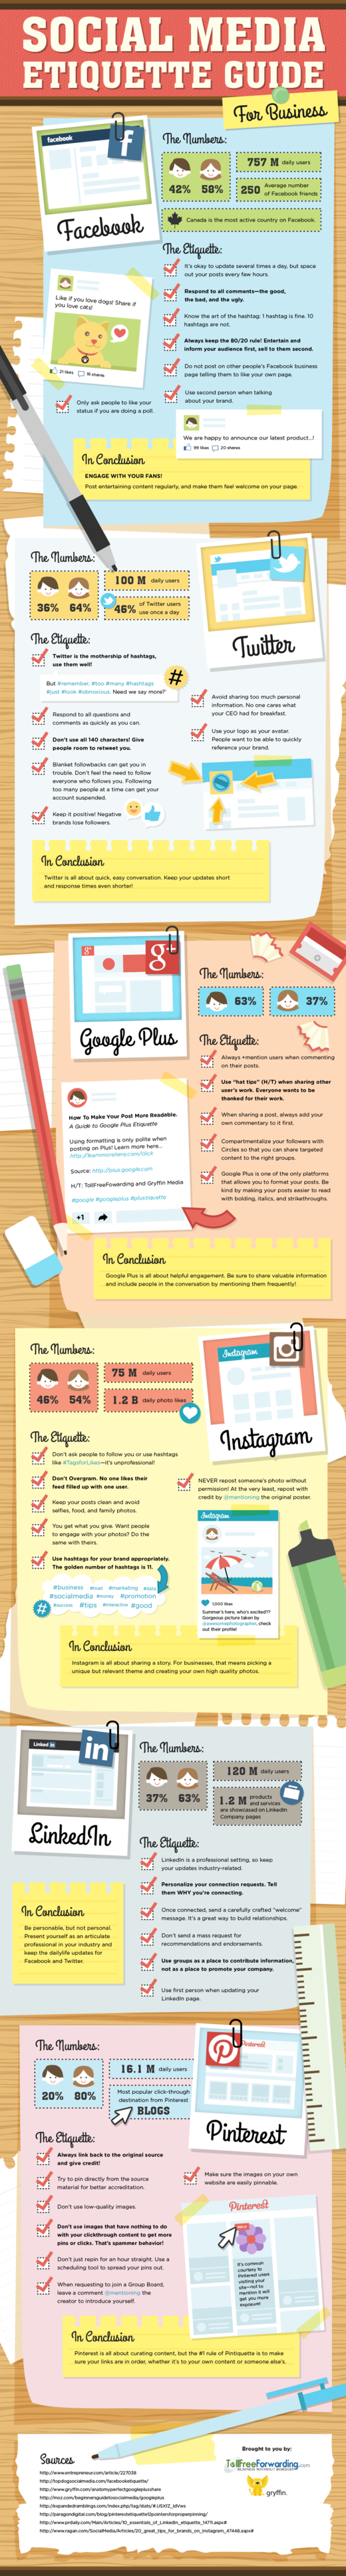 Social_media_etiquette